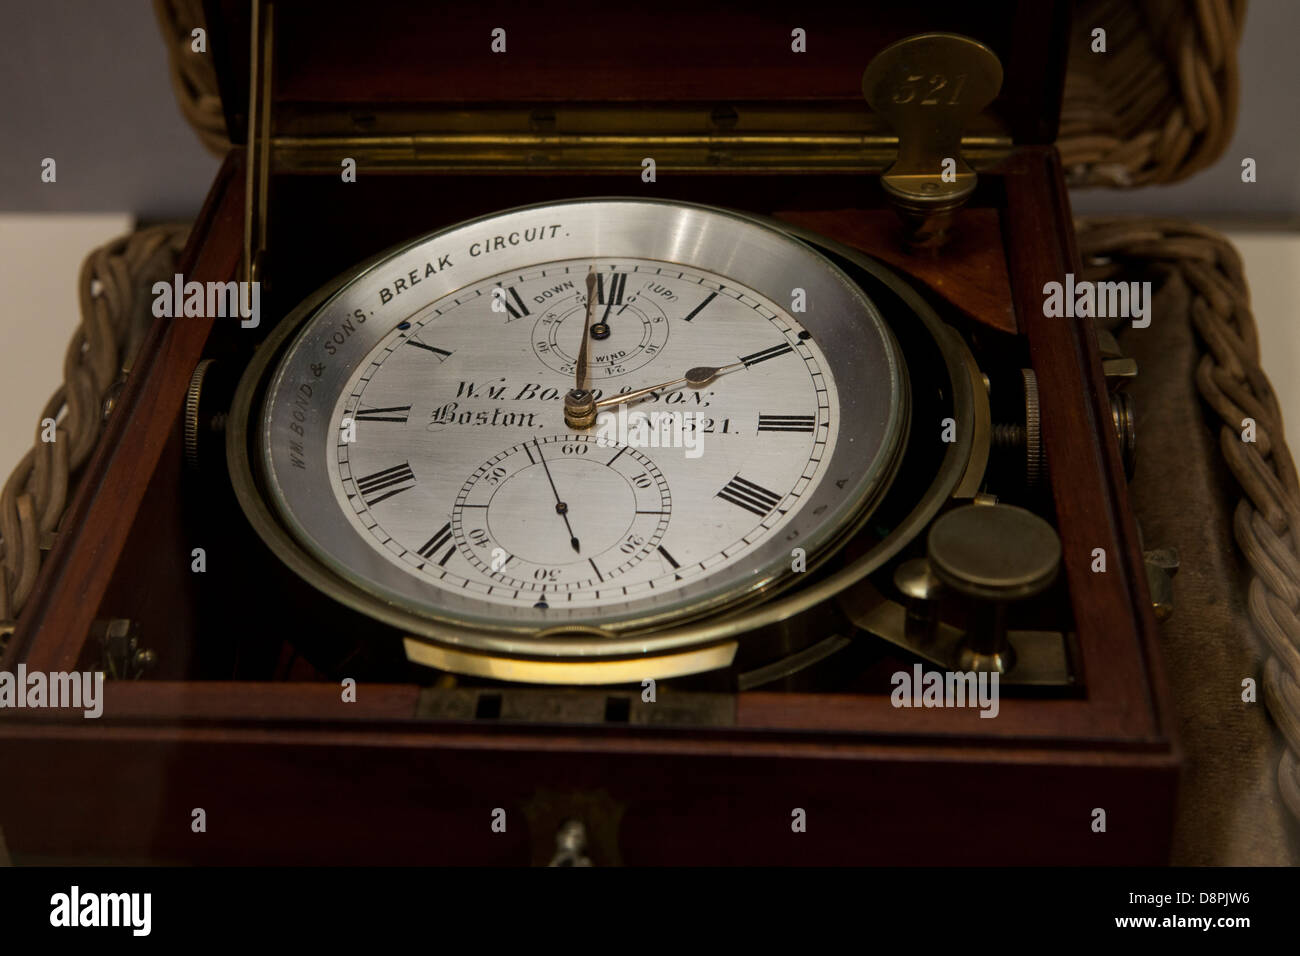 Marine Chronometer by William Bond & Son, ca 1870 - Stock Image